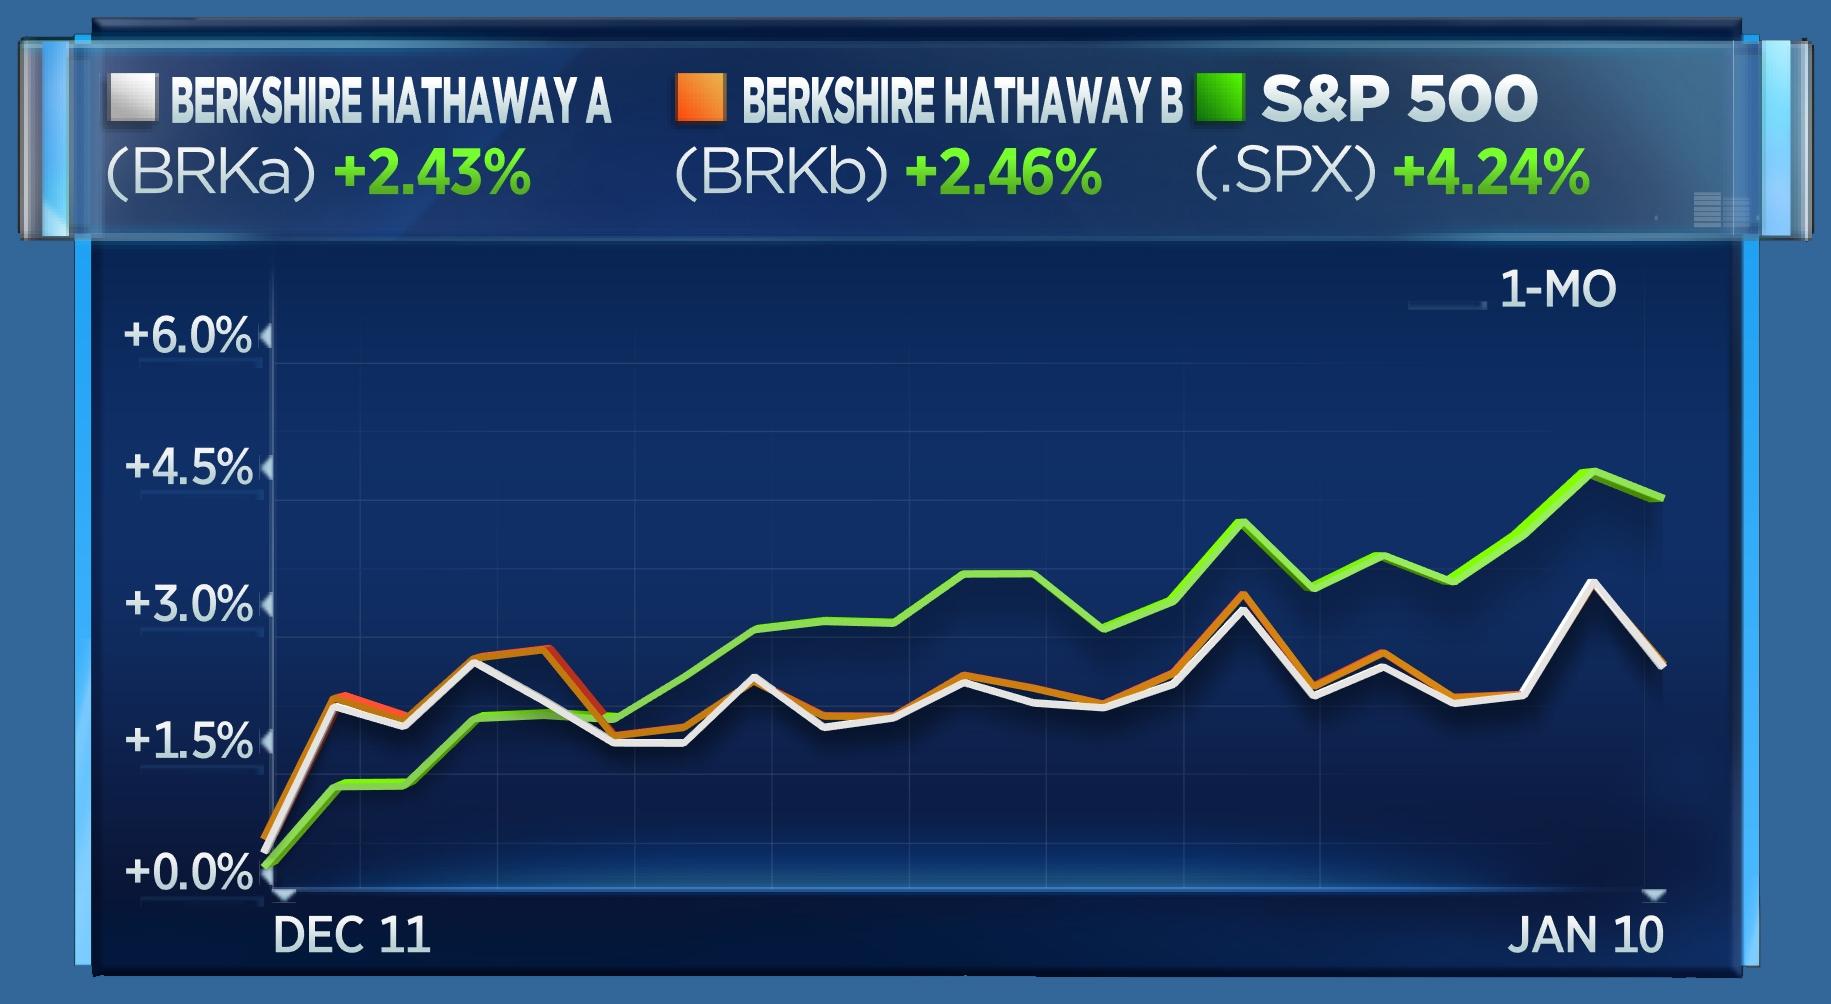 BRK vs S&P - 1 month